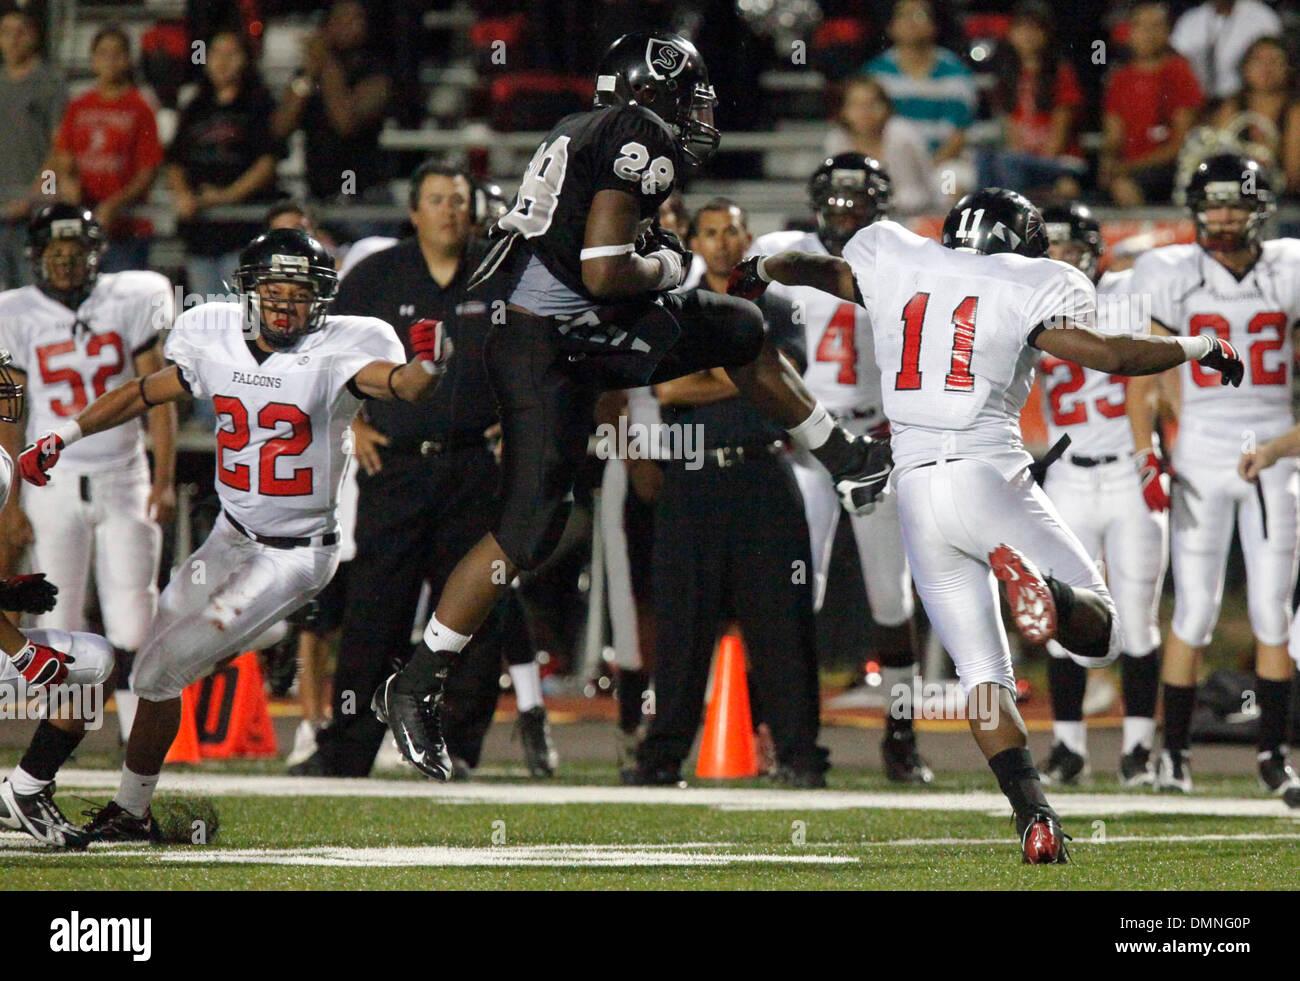 Sep 04, 2009 - Schertz, Texas, U.S. - Steele's MALCOLM BROWN catches a pass between Stevens defenders Jordan Davis Stock Photo